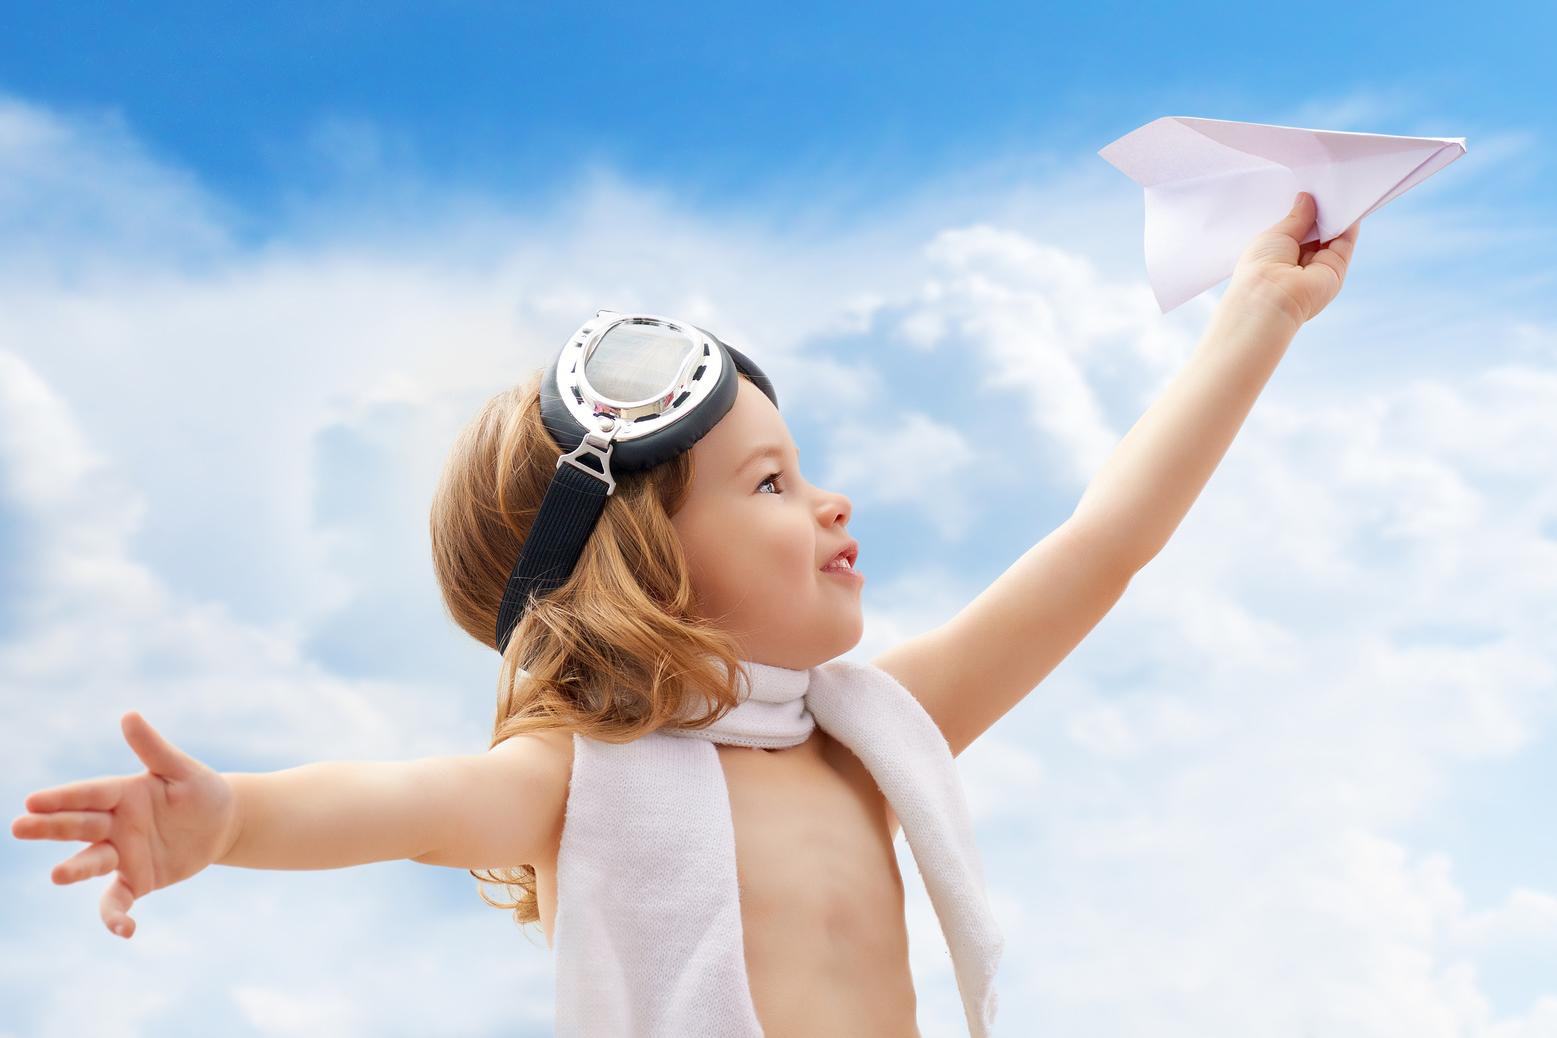 A child plays an airplane pilot